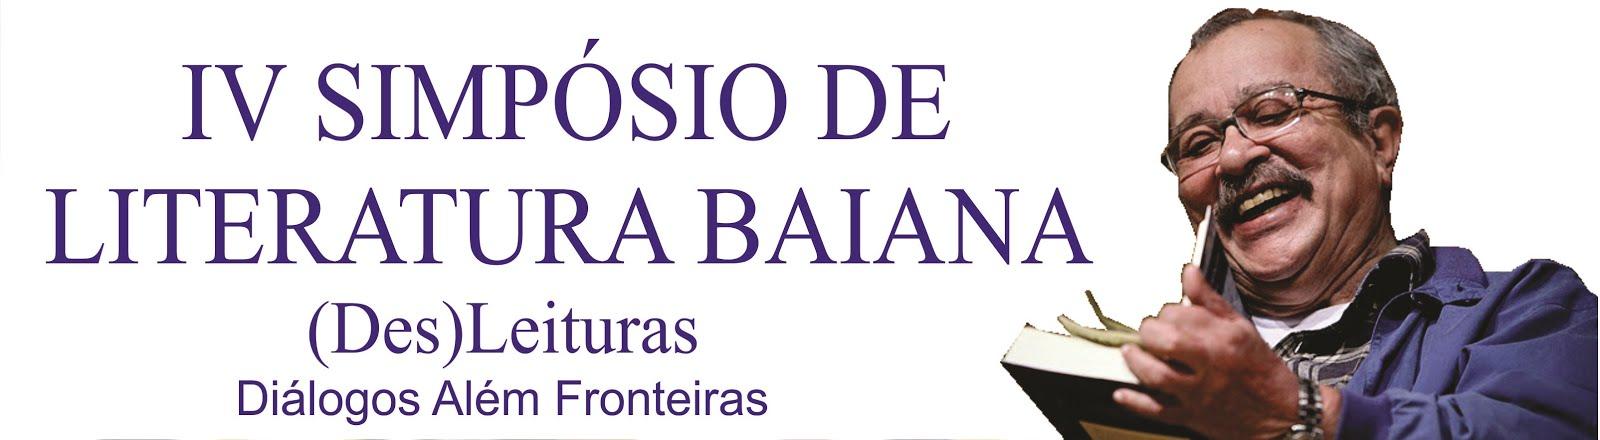 IV SIMPÓSIO DE LITERATURA BAIANA